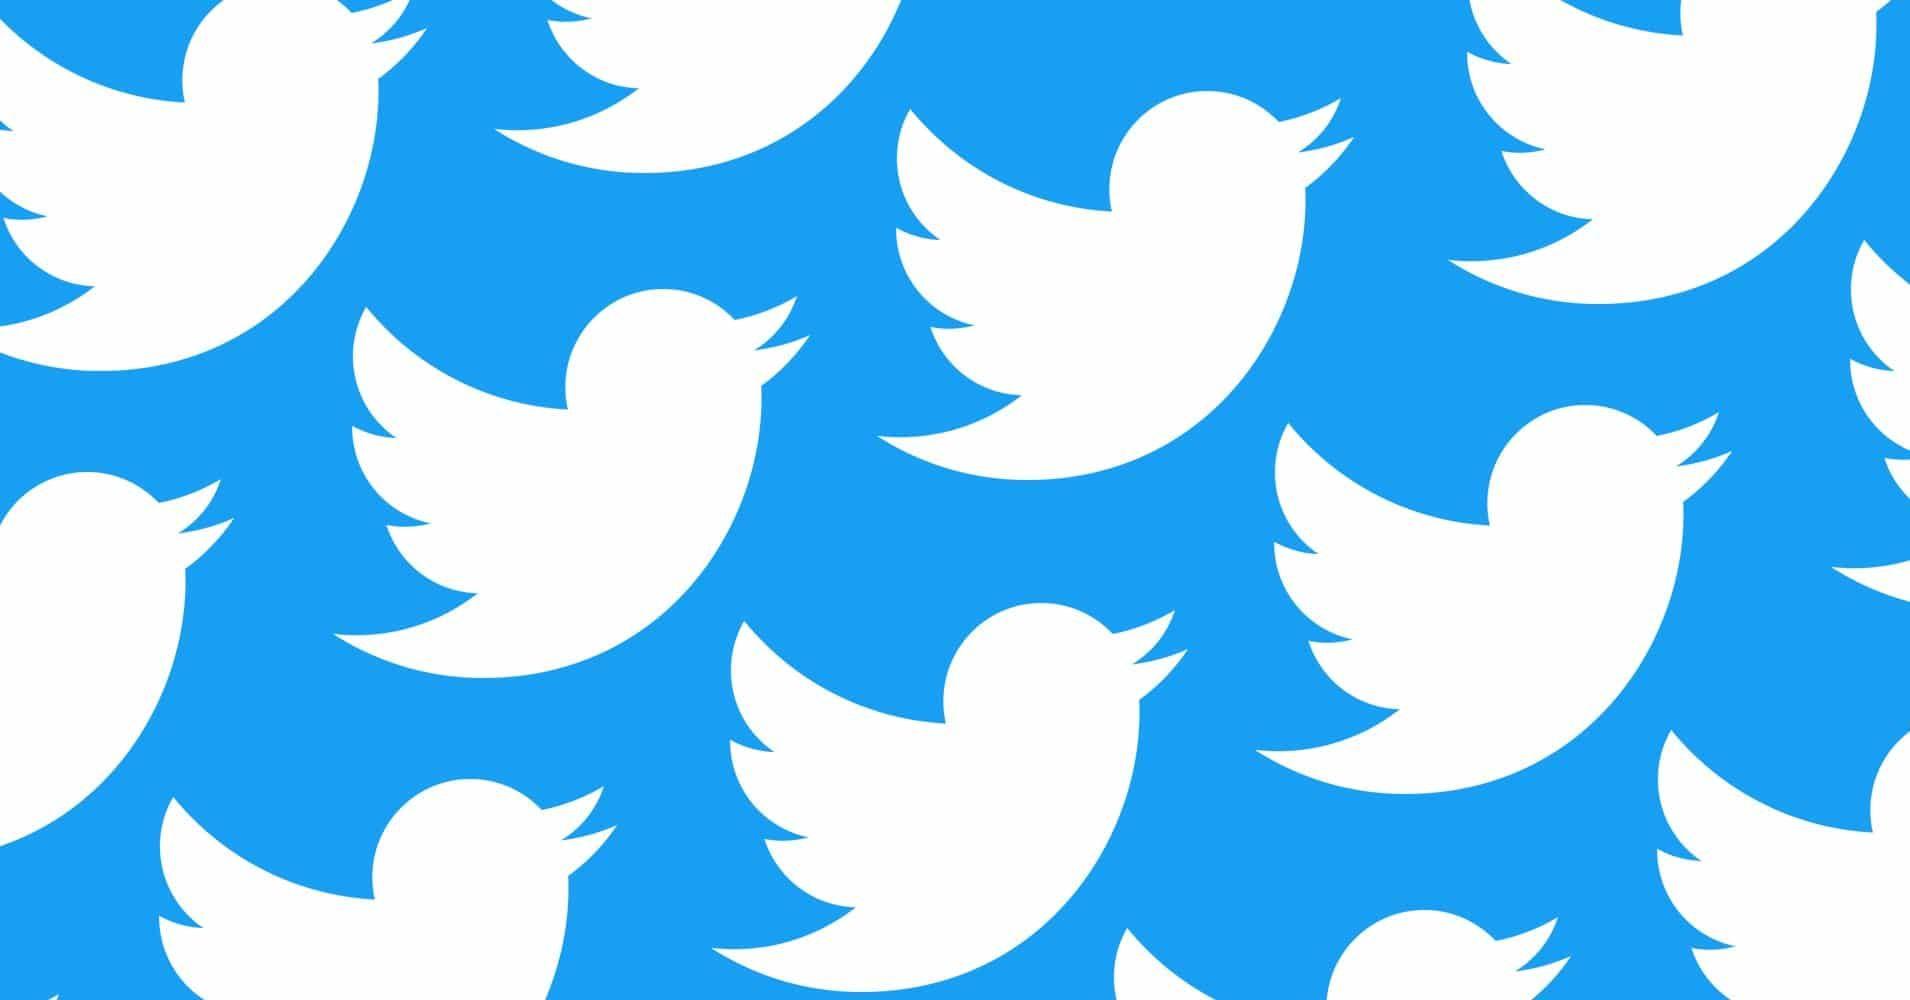 تويتر تسجل 17 مليون تغريدة قبل دخول شهر رمضان 2020 I Maurinews Twitter Reseaux Sociaux Tweets